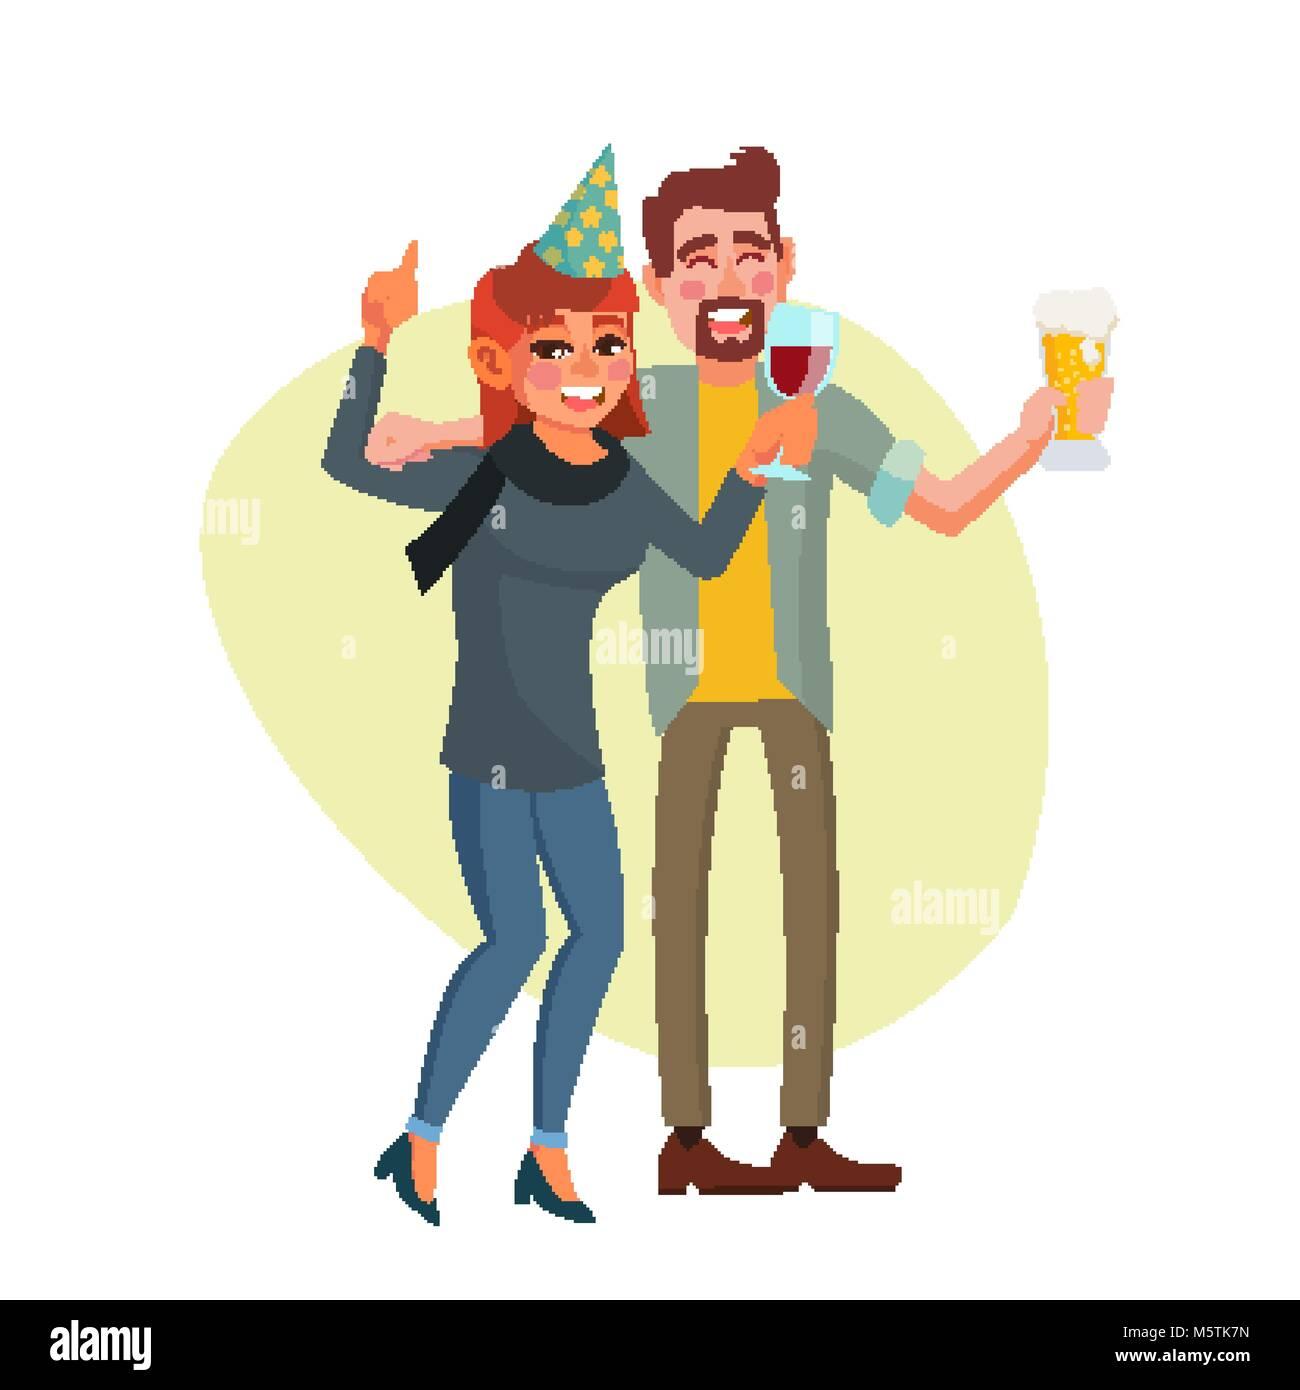 cartoon drunk man stockfotos cartoon drunk man bilder. Black Bedroom Furniture Sets. Home Design Ideas